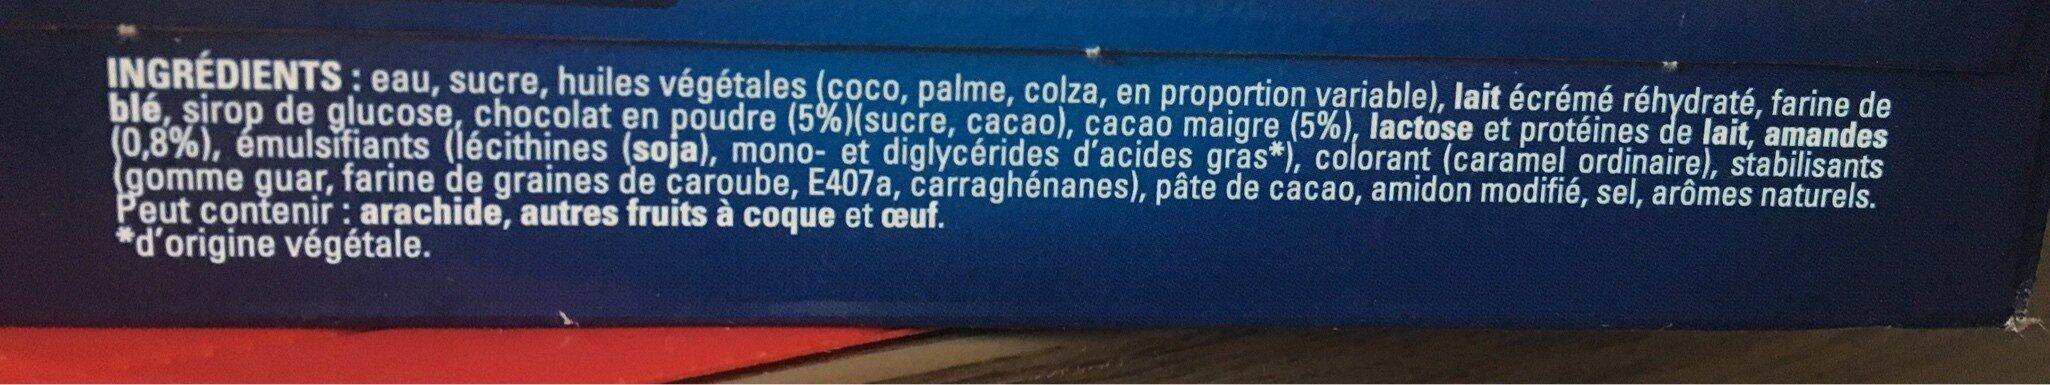 Extrême Chocolat - Ingrédients - fr